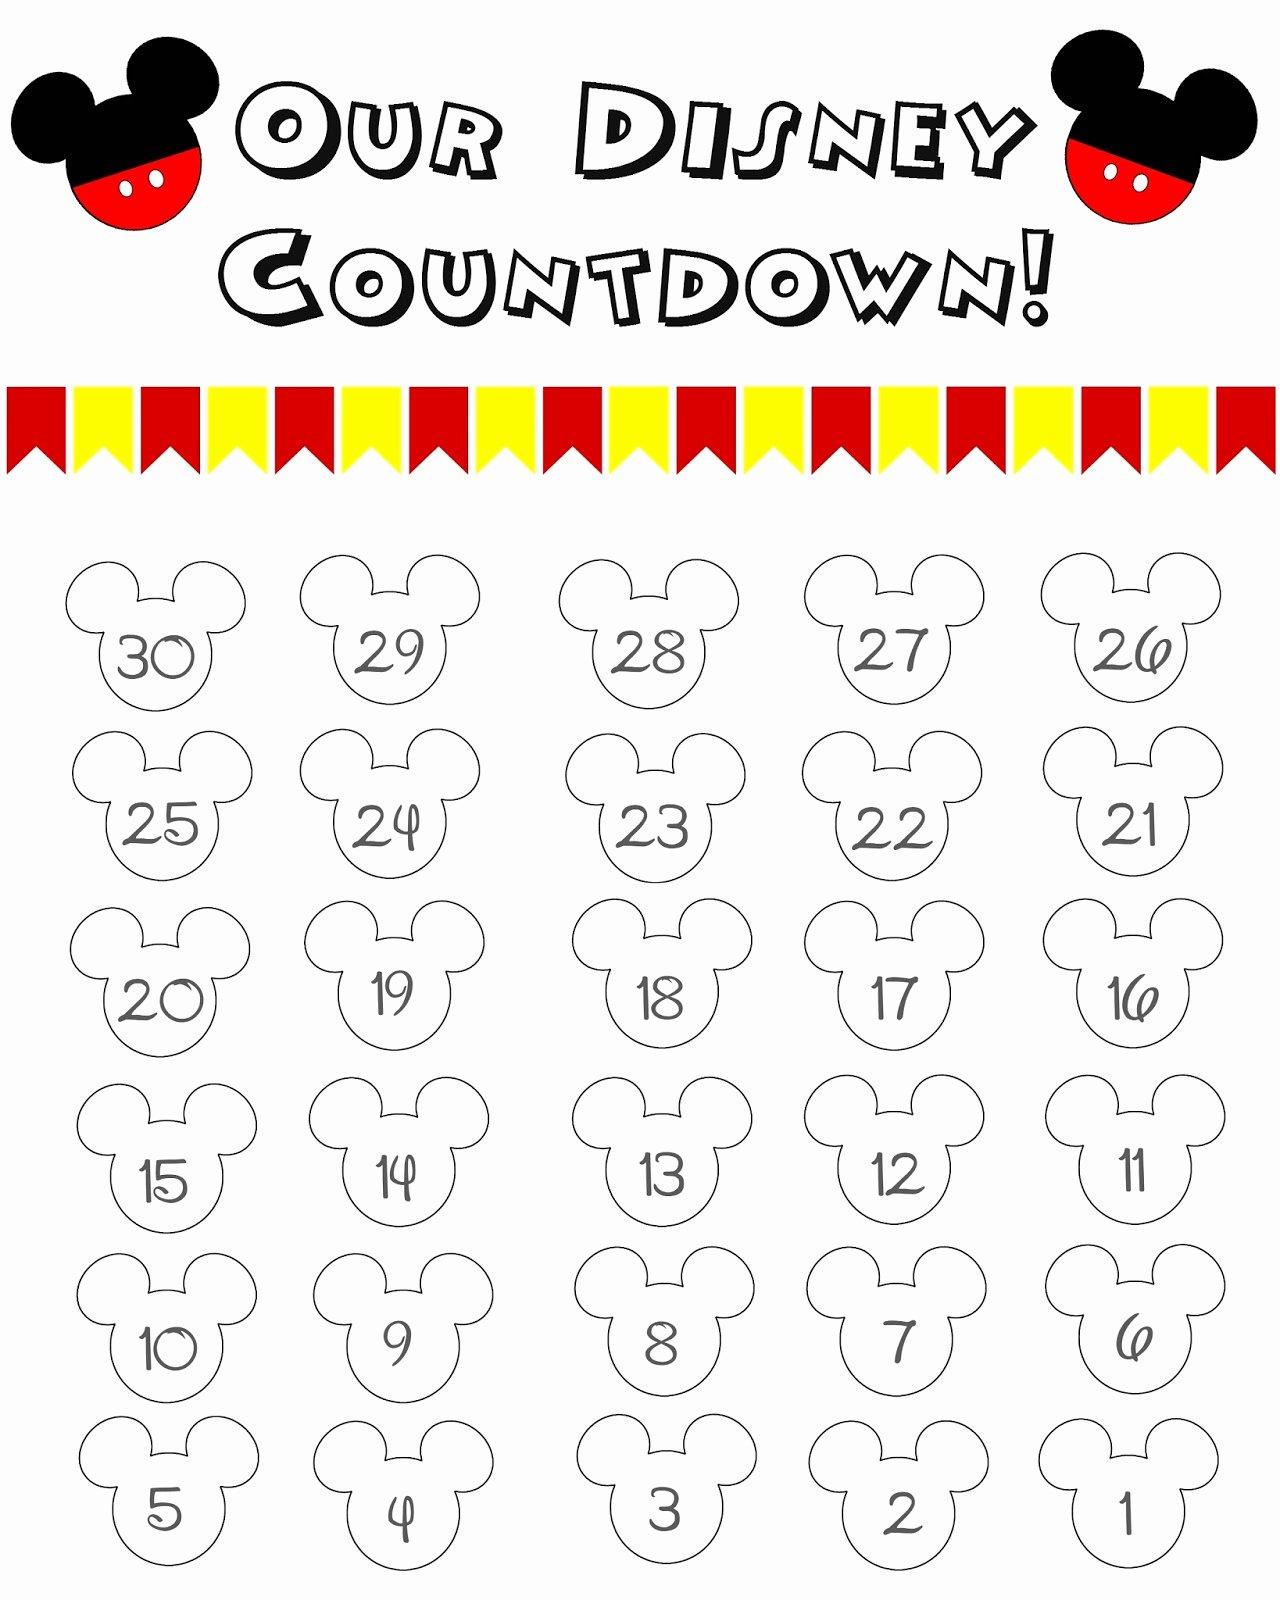 Printable Countdown Calendar Template New 10 Fun Printable Disney Countdown Calendars